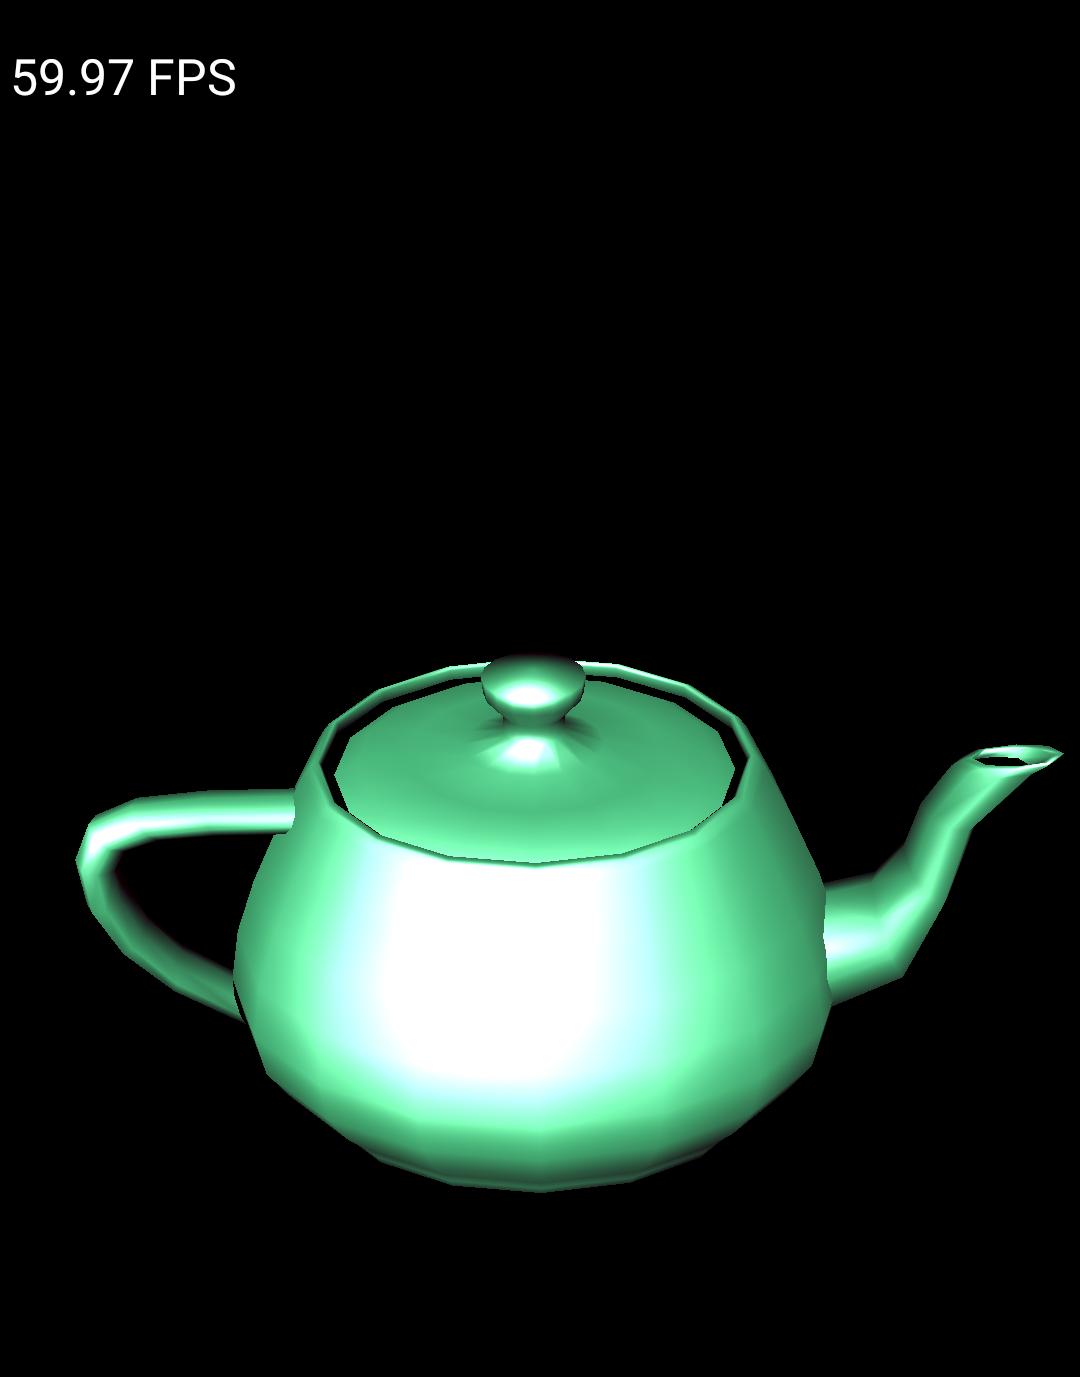 Teapot sample running on an emulator